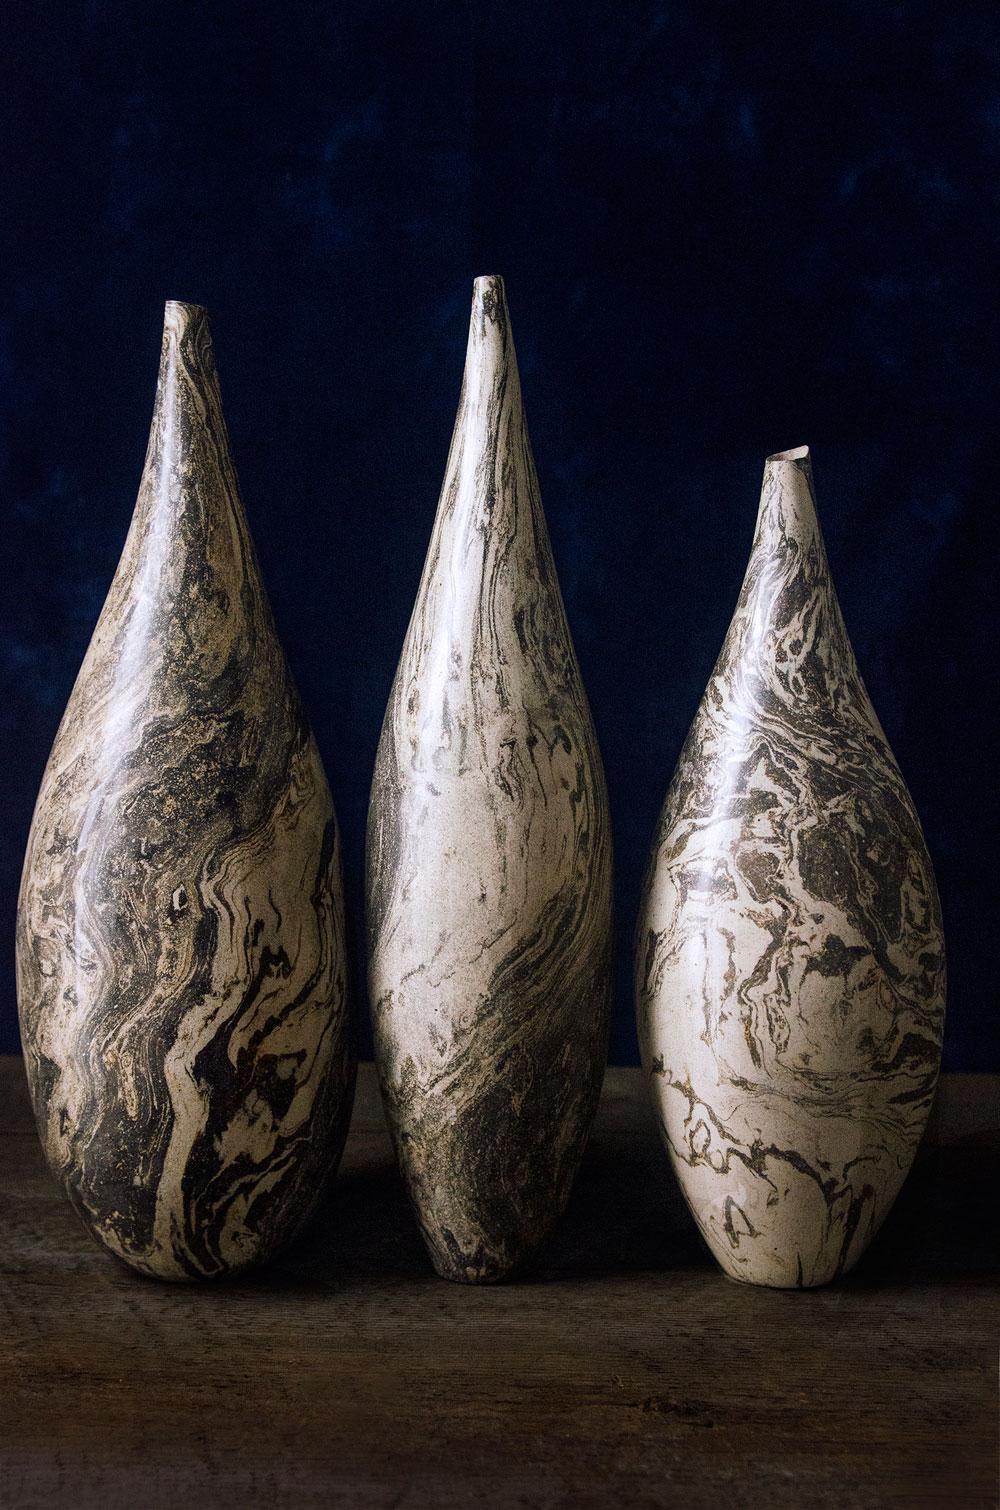 Raw Bottle Triptych No. 1